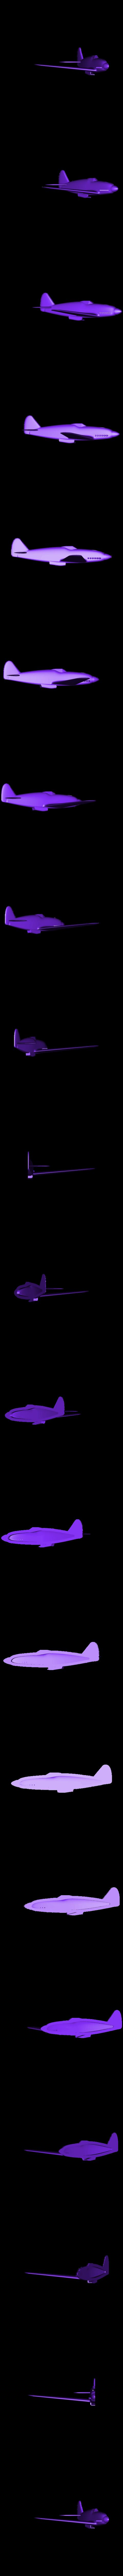 KI61_left_HD.STL Download STL file Kawasaki Ki-61 Hien • 3D printing template, 3Dmodeling